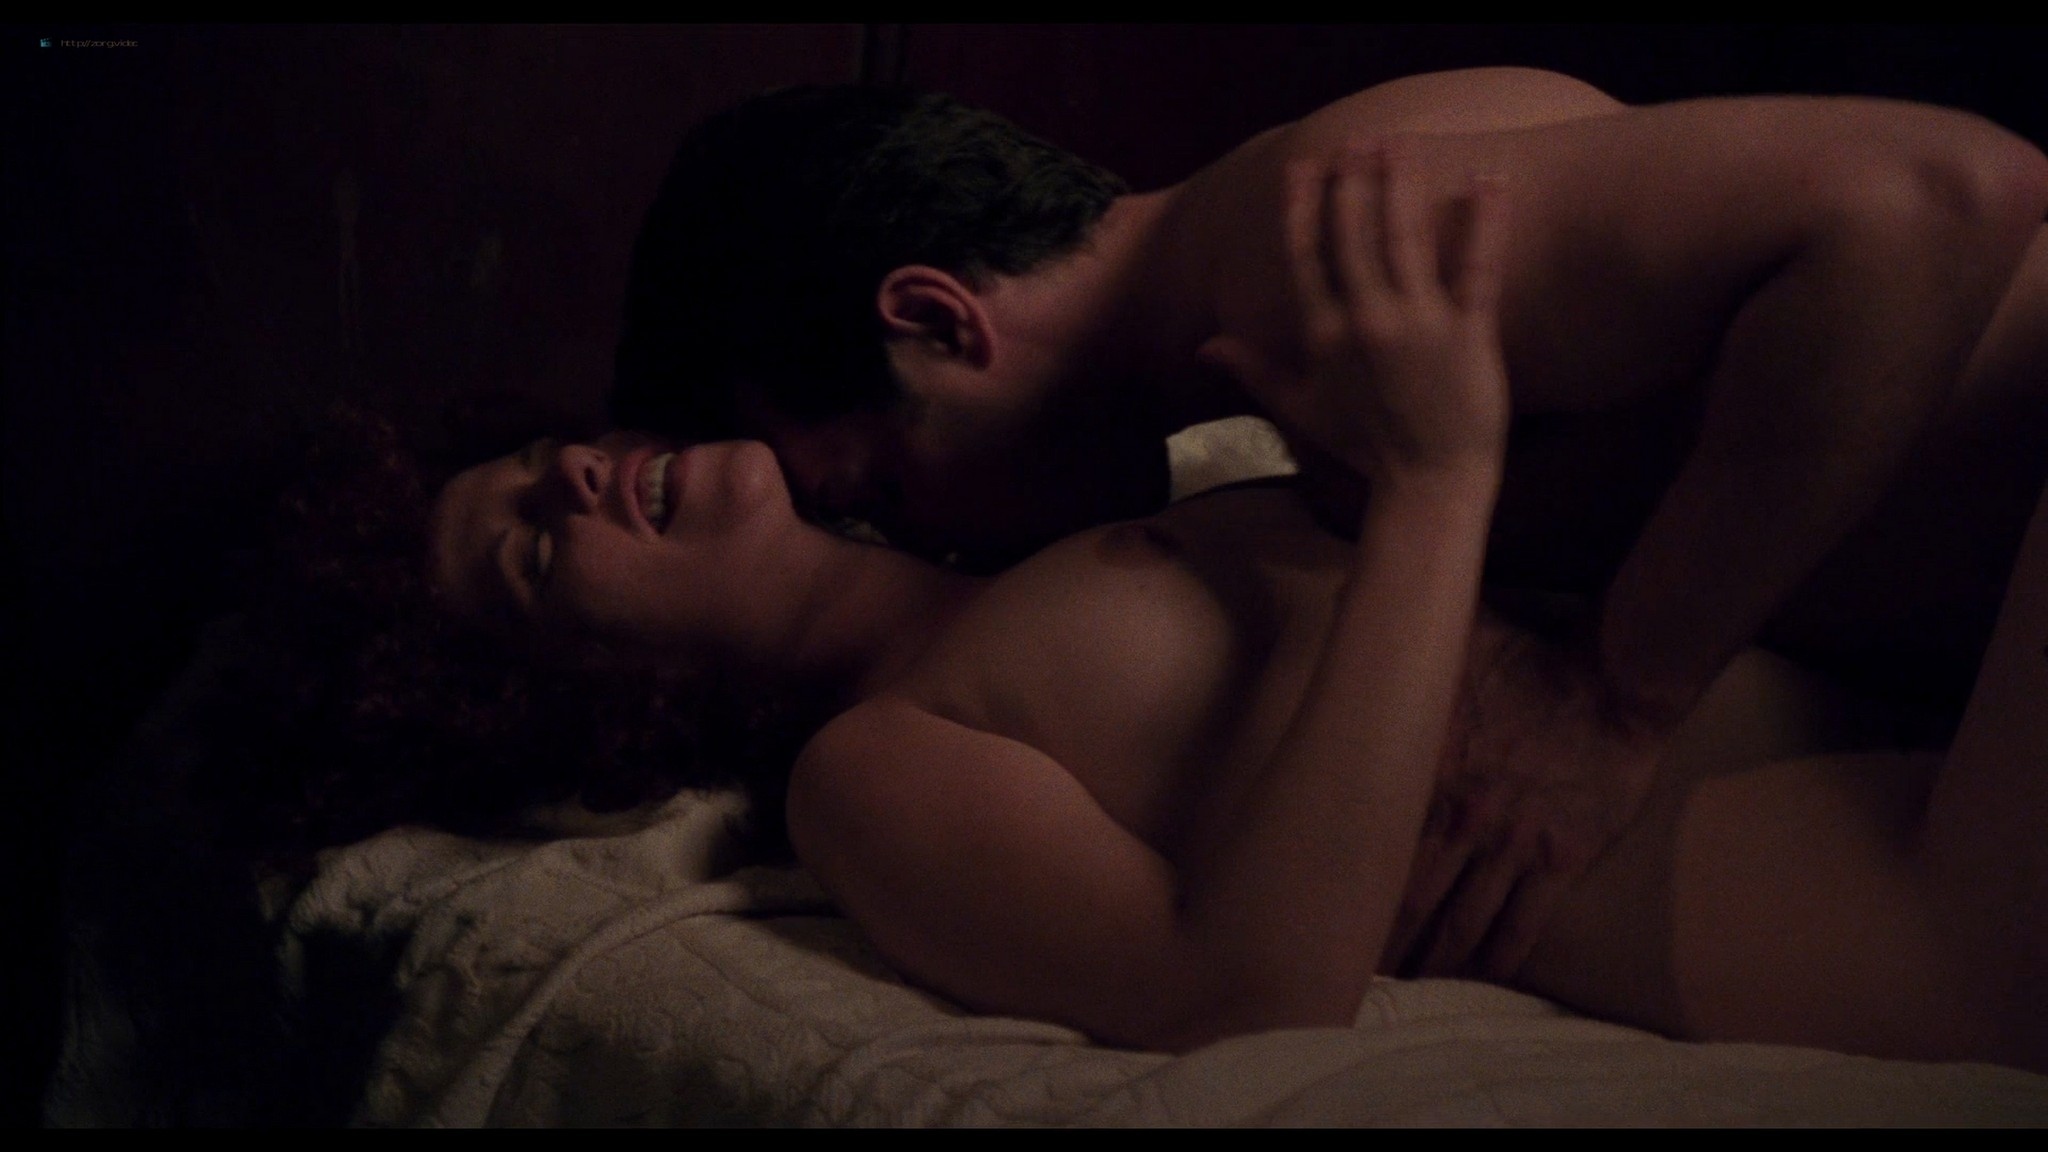 Jennifer Delora nude hot sex - Deadly Manor (1990) HD 1080p BluRay (7)